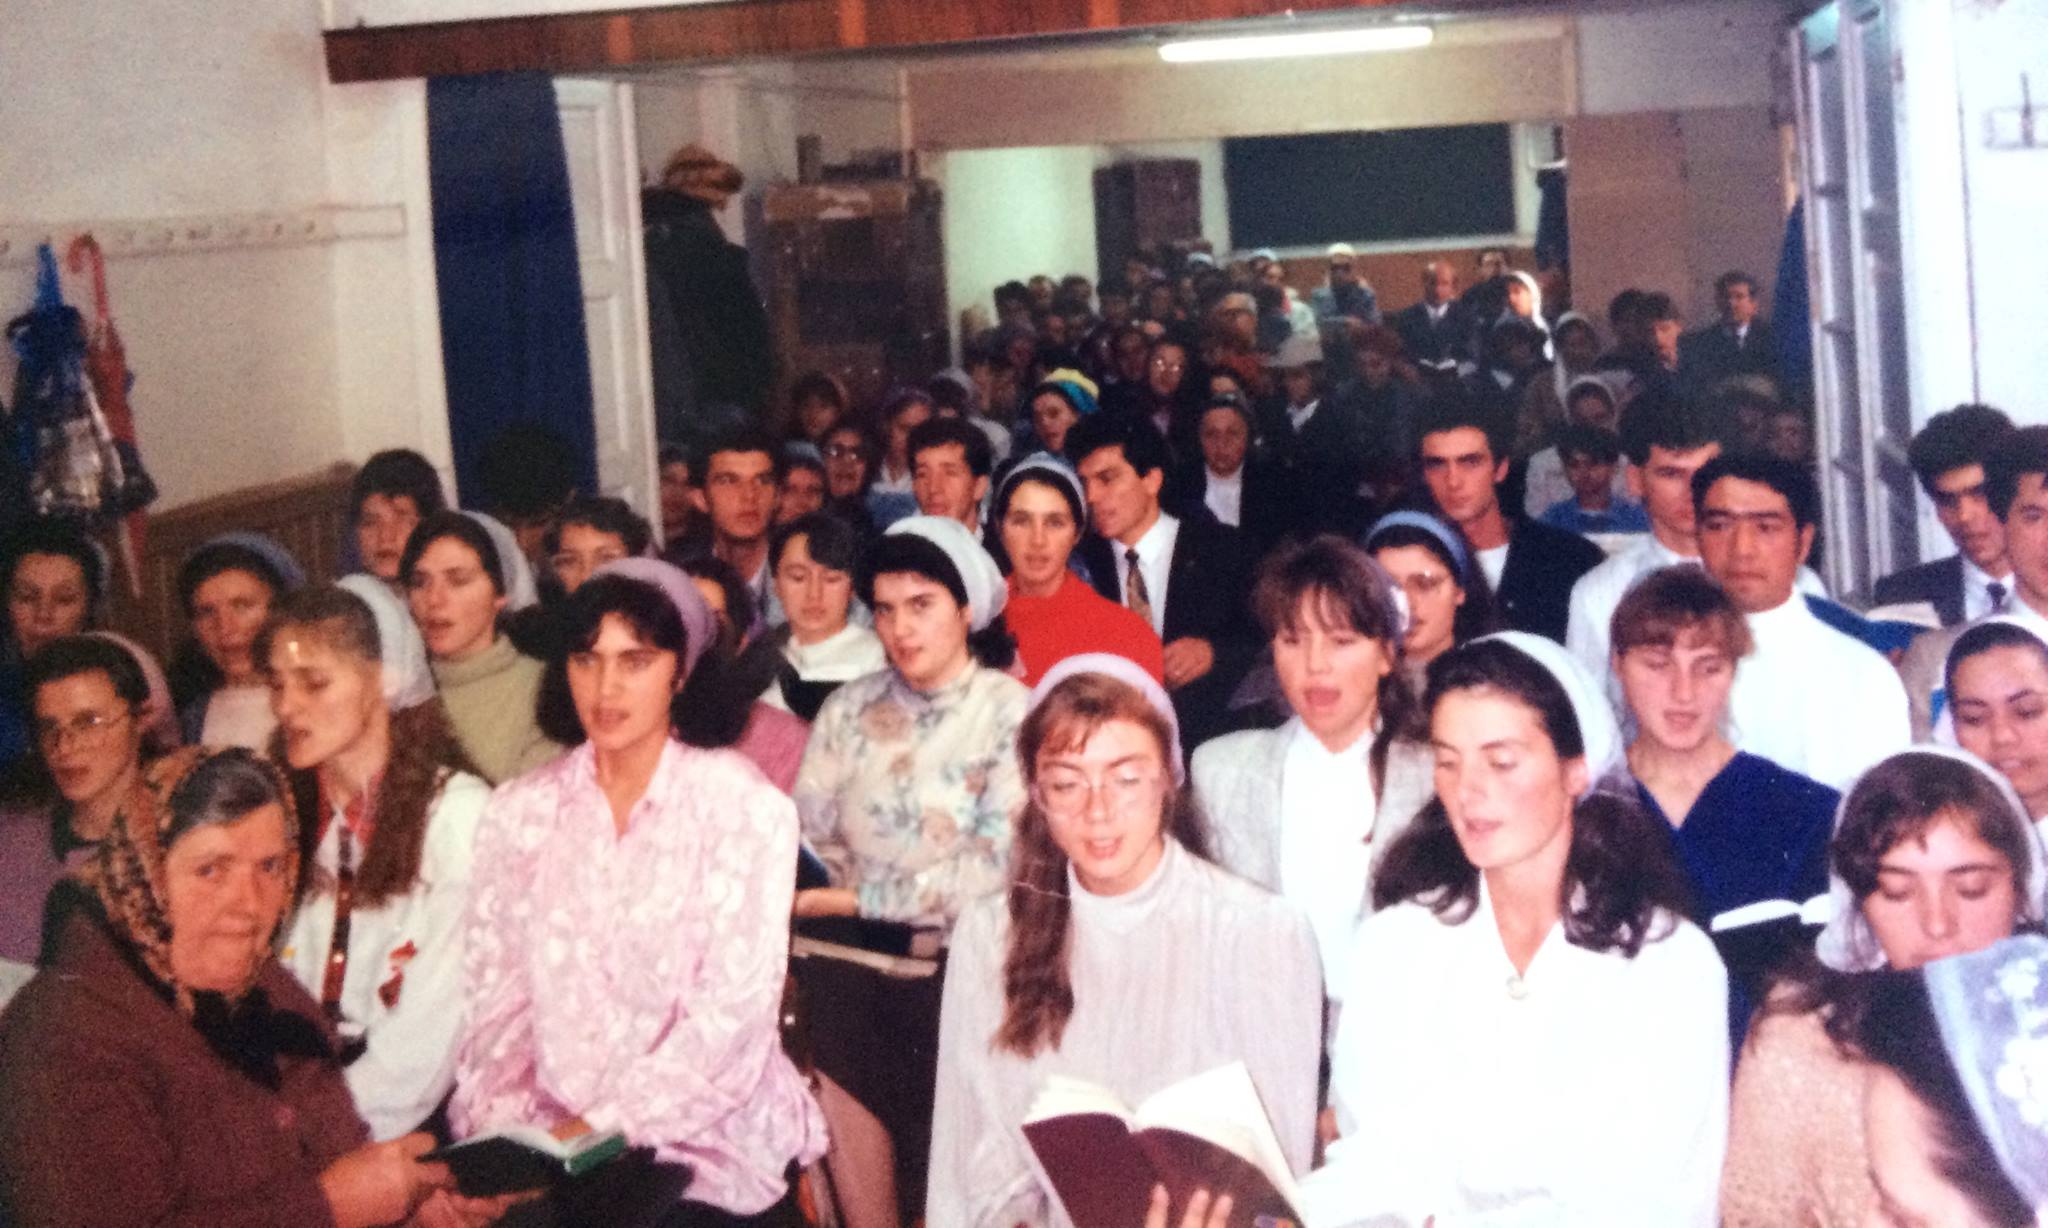 BISERICA CRESTINA DUPA EVANGHELIE DRAGOS VODA IN 1994